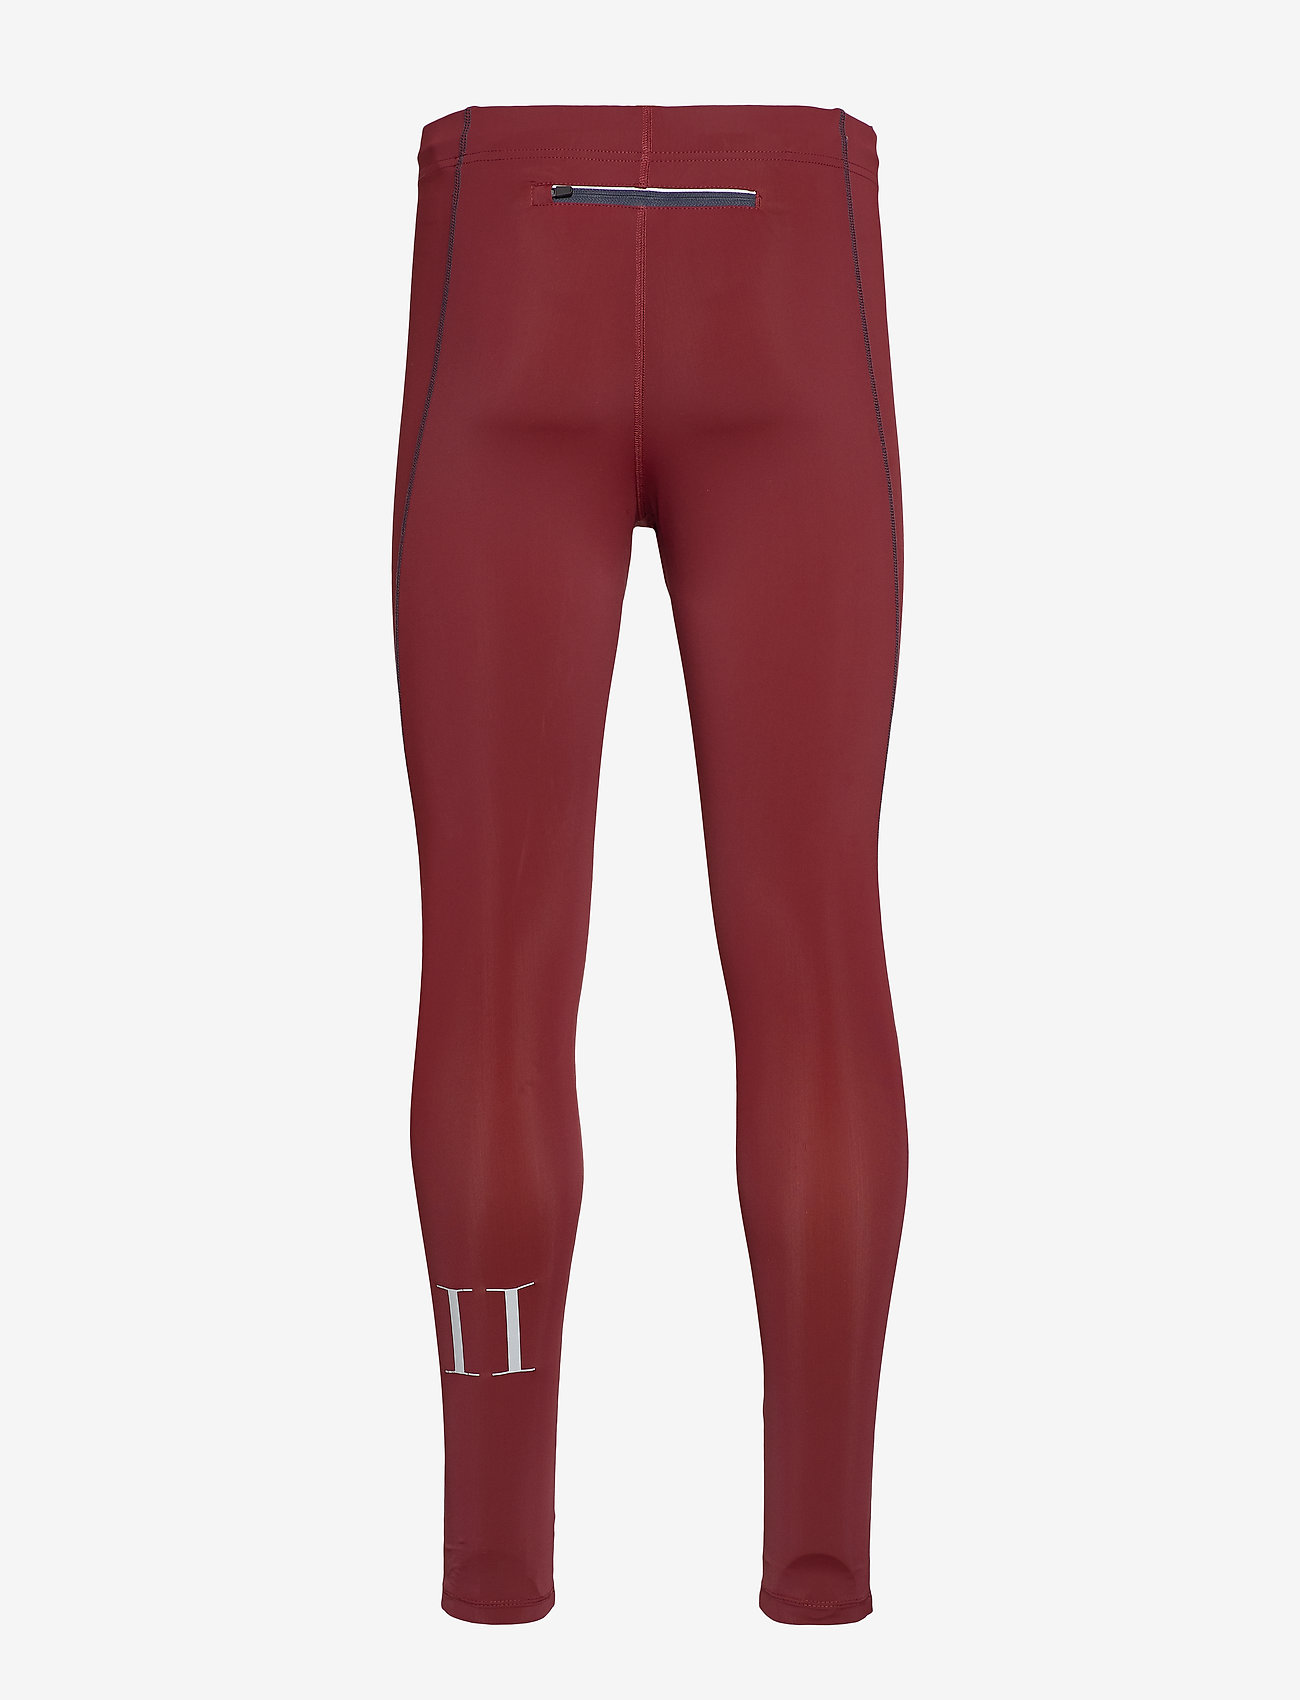 Les Deux - Men's Long Tight Sogndal - running & training tights - clay red - 1